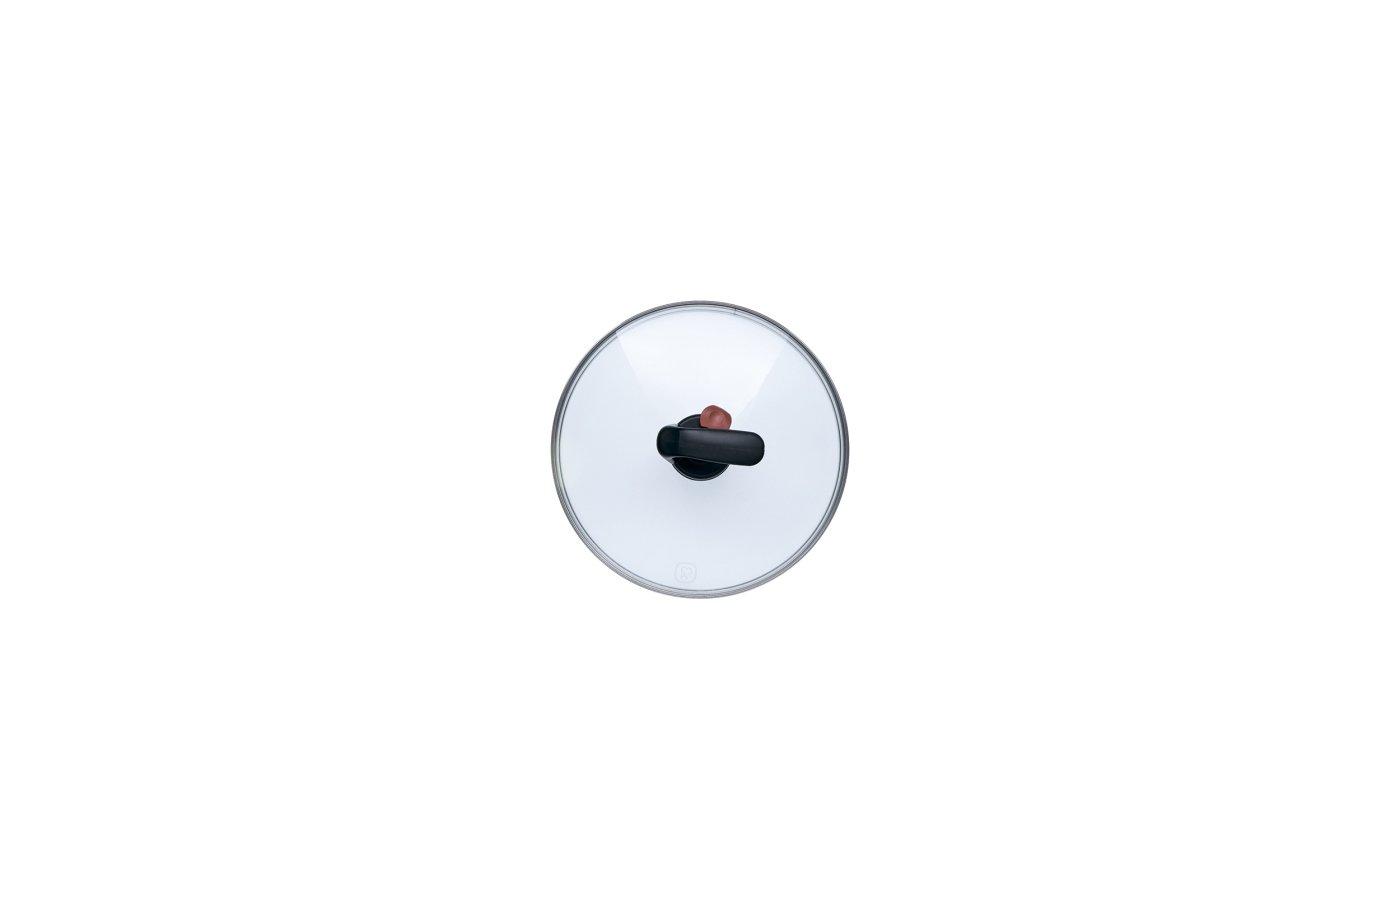 крышка до 24 см Rondell TFG-24 (0)260614 Крышка